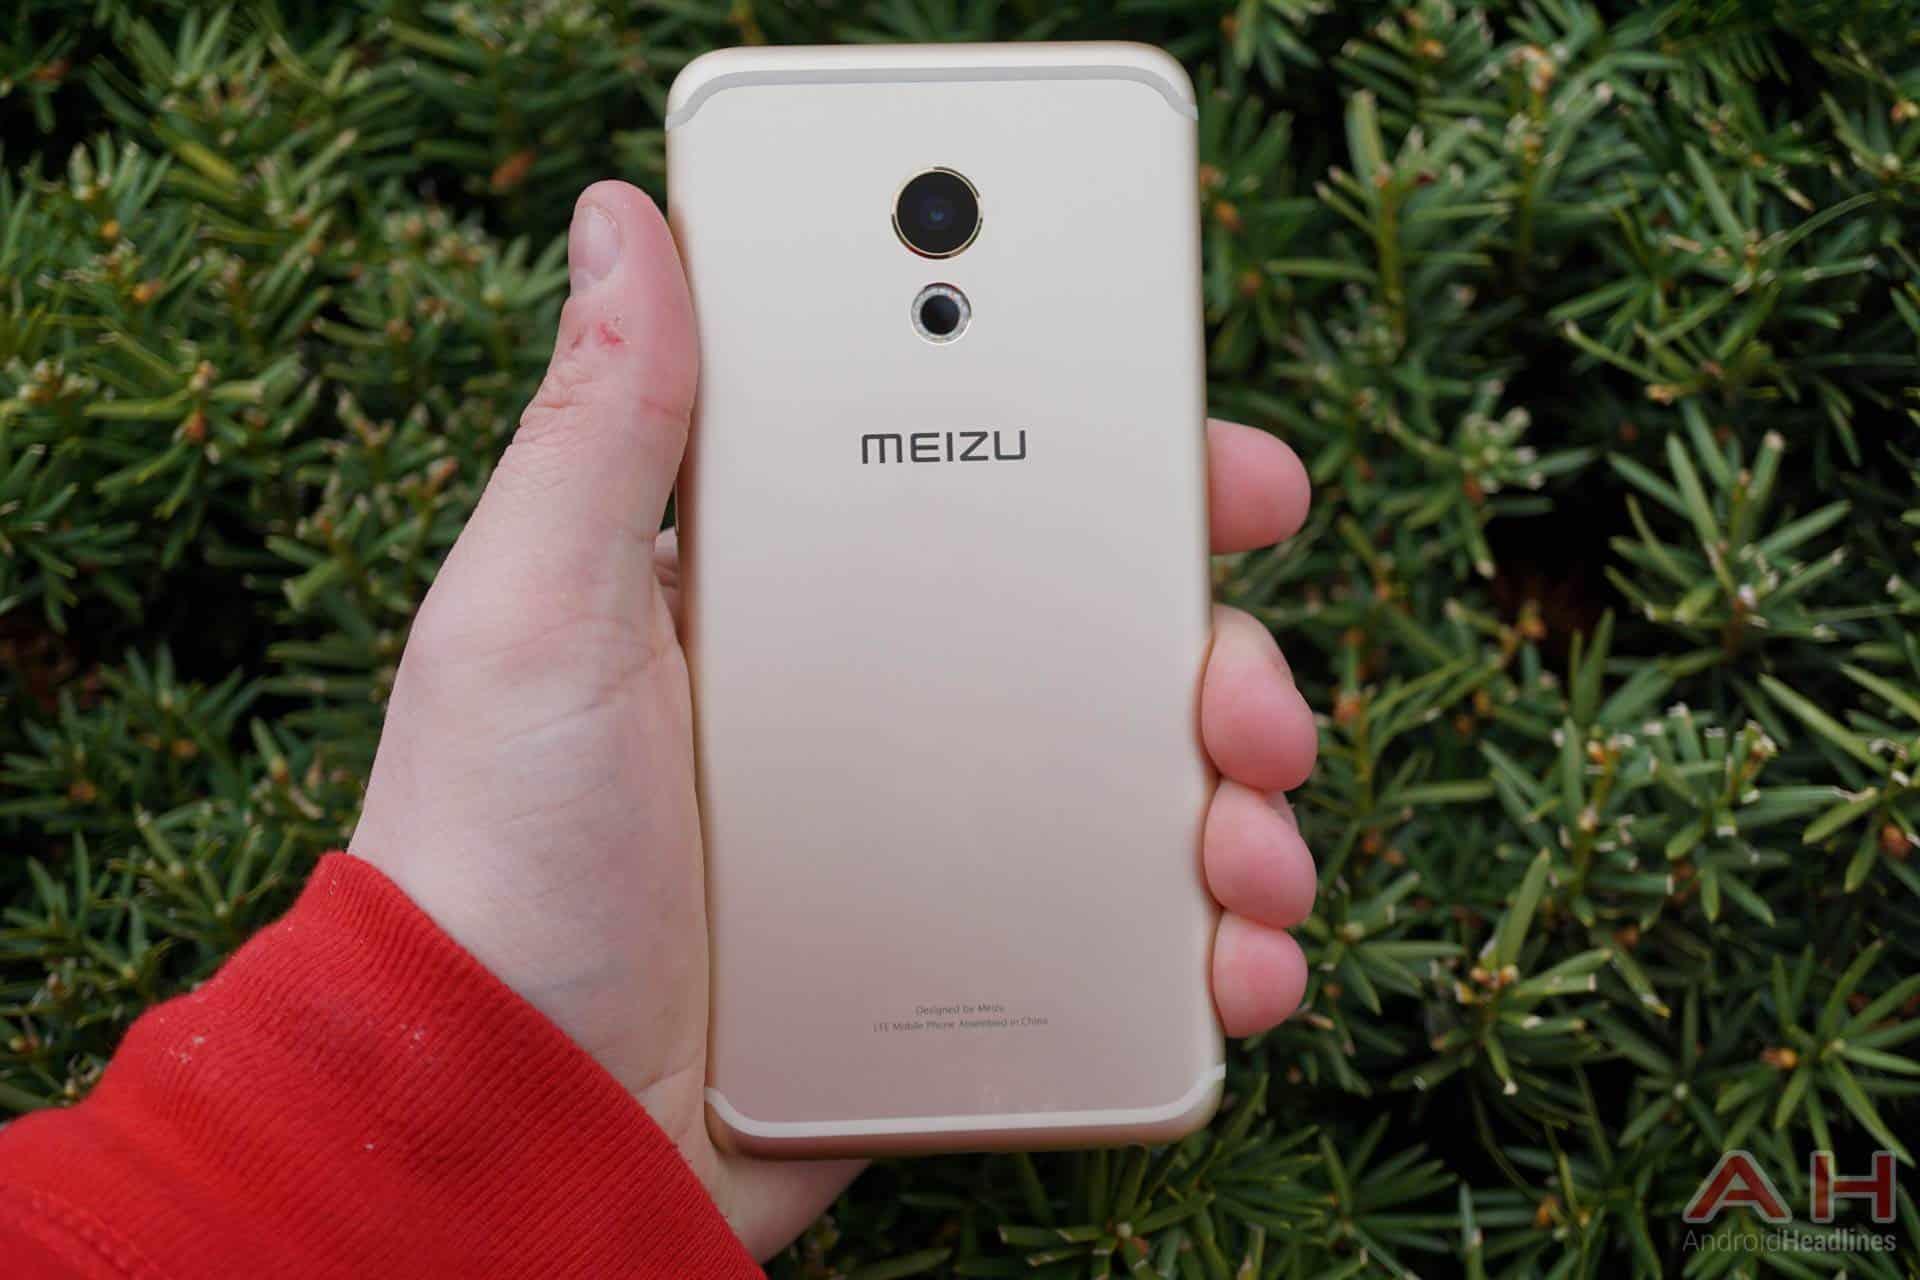 Opinion: Meizu & Xiaomi, Please Redesign Your Smartphones ...